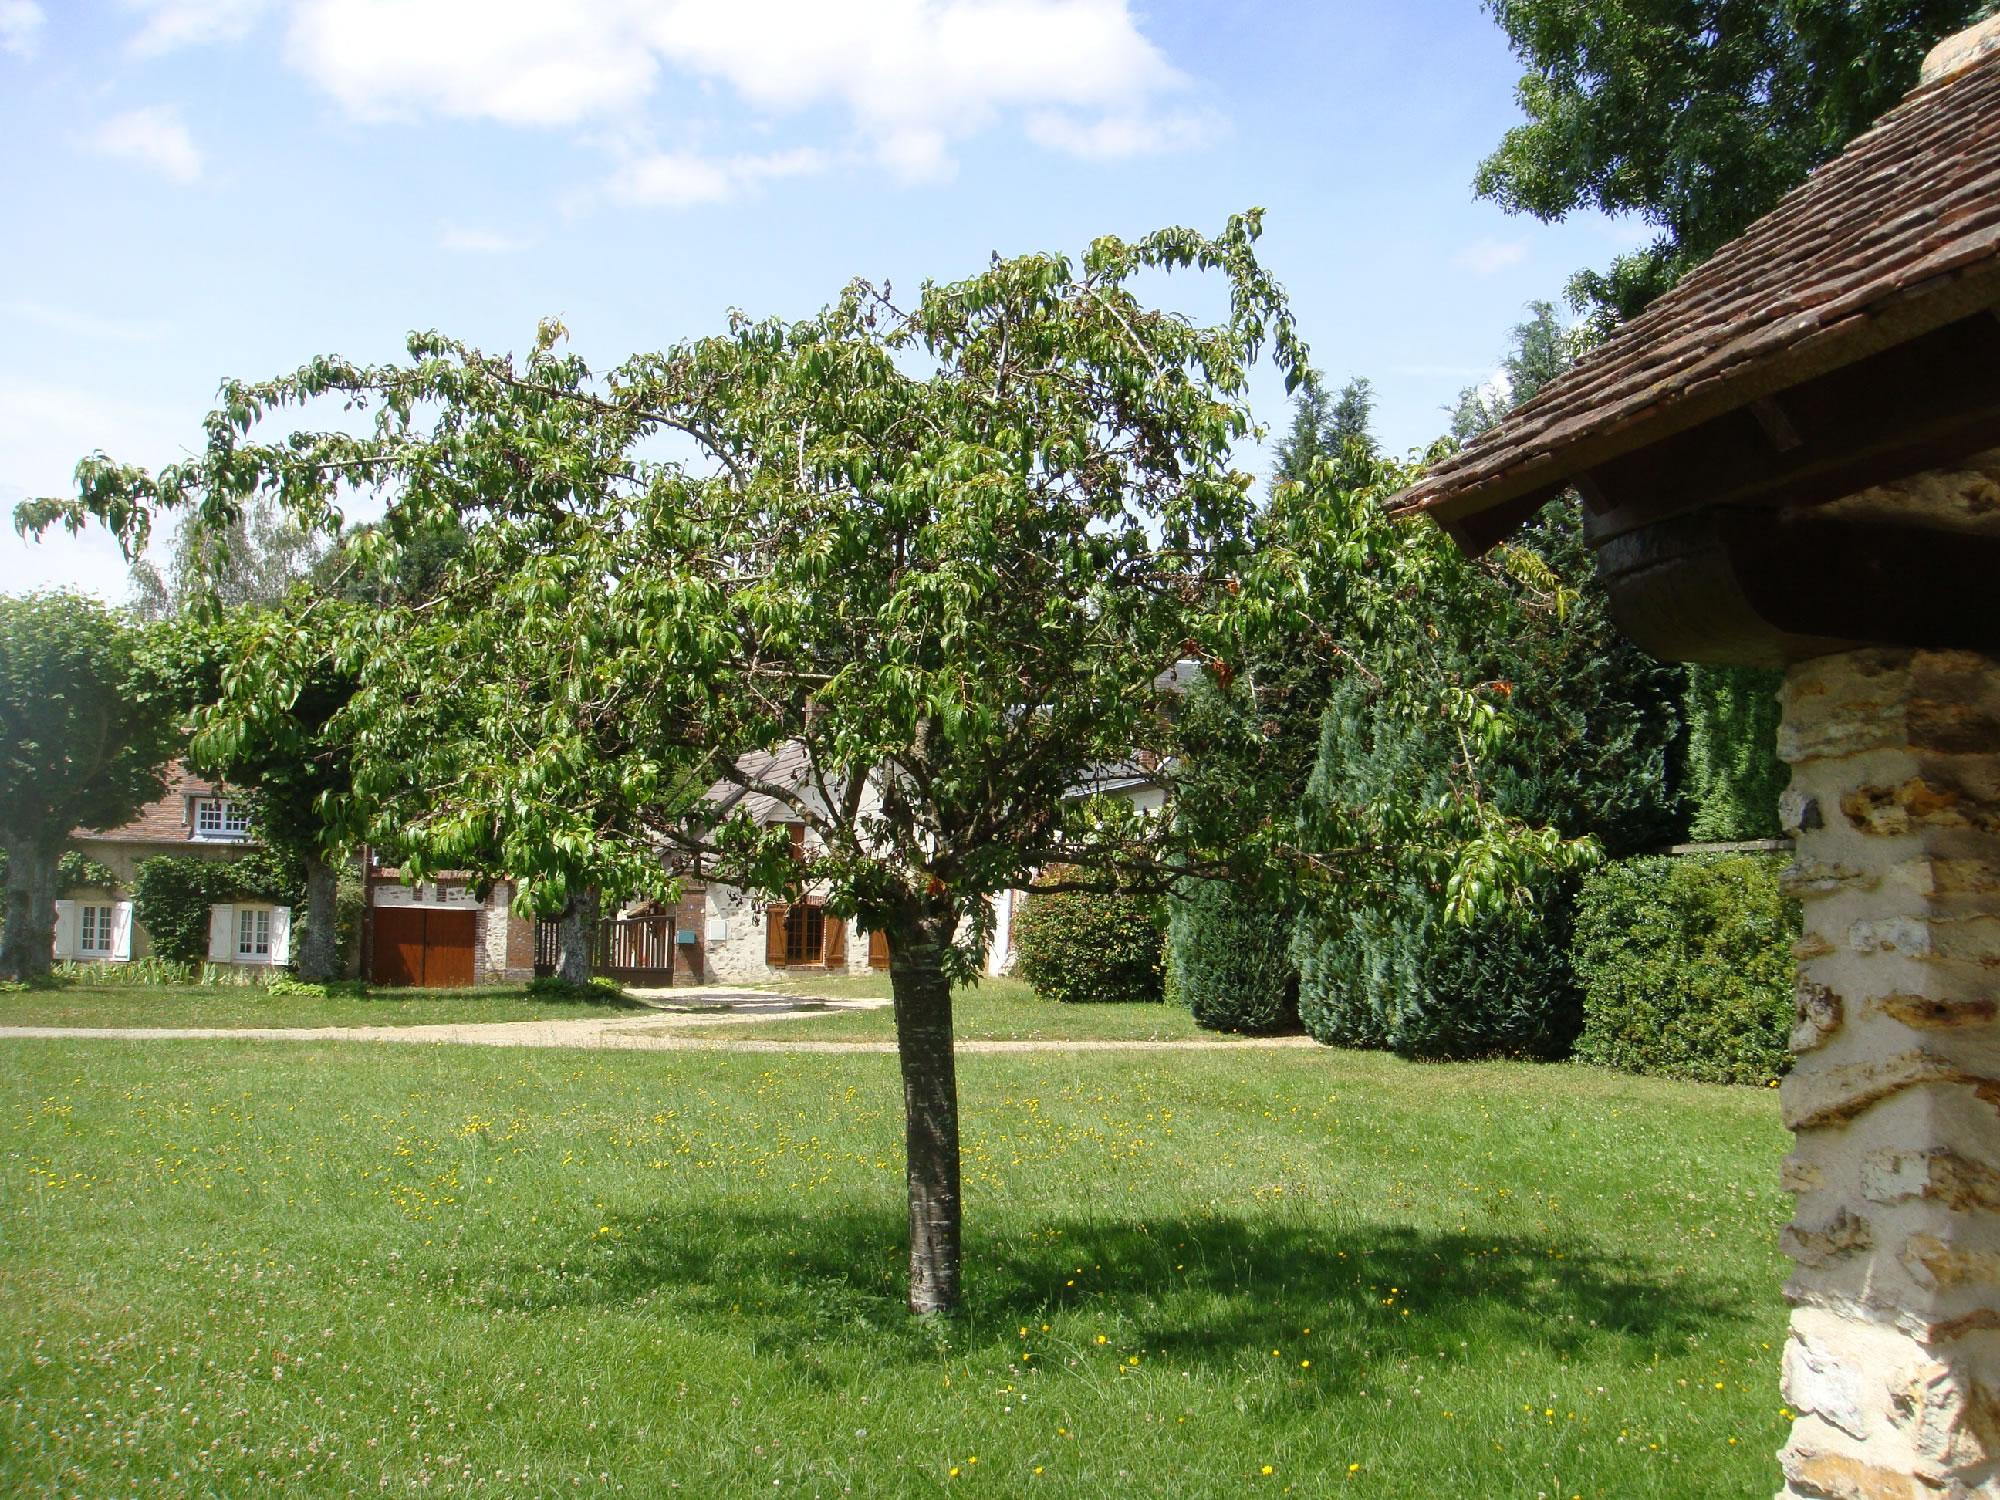 cerisier bicentenaire.jpg